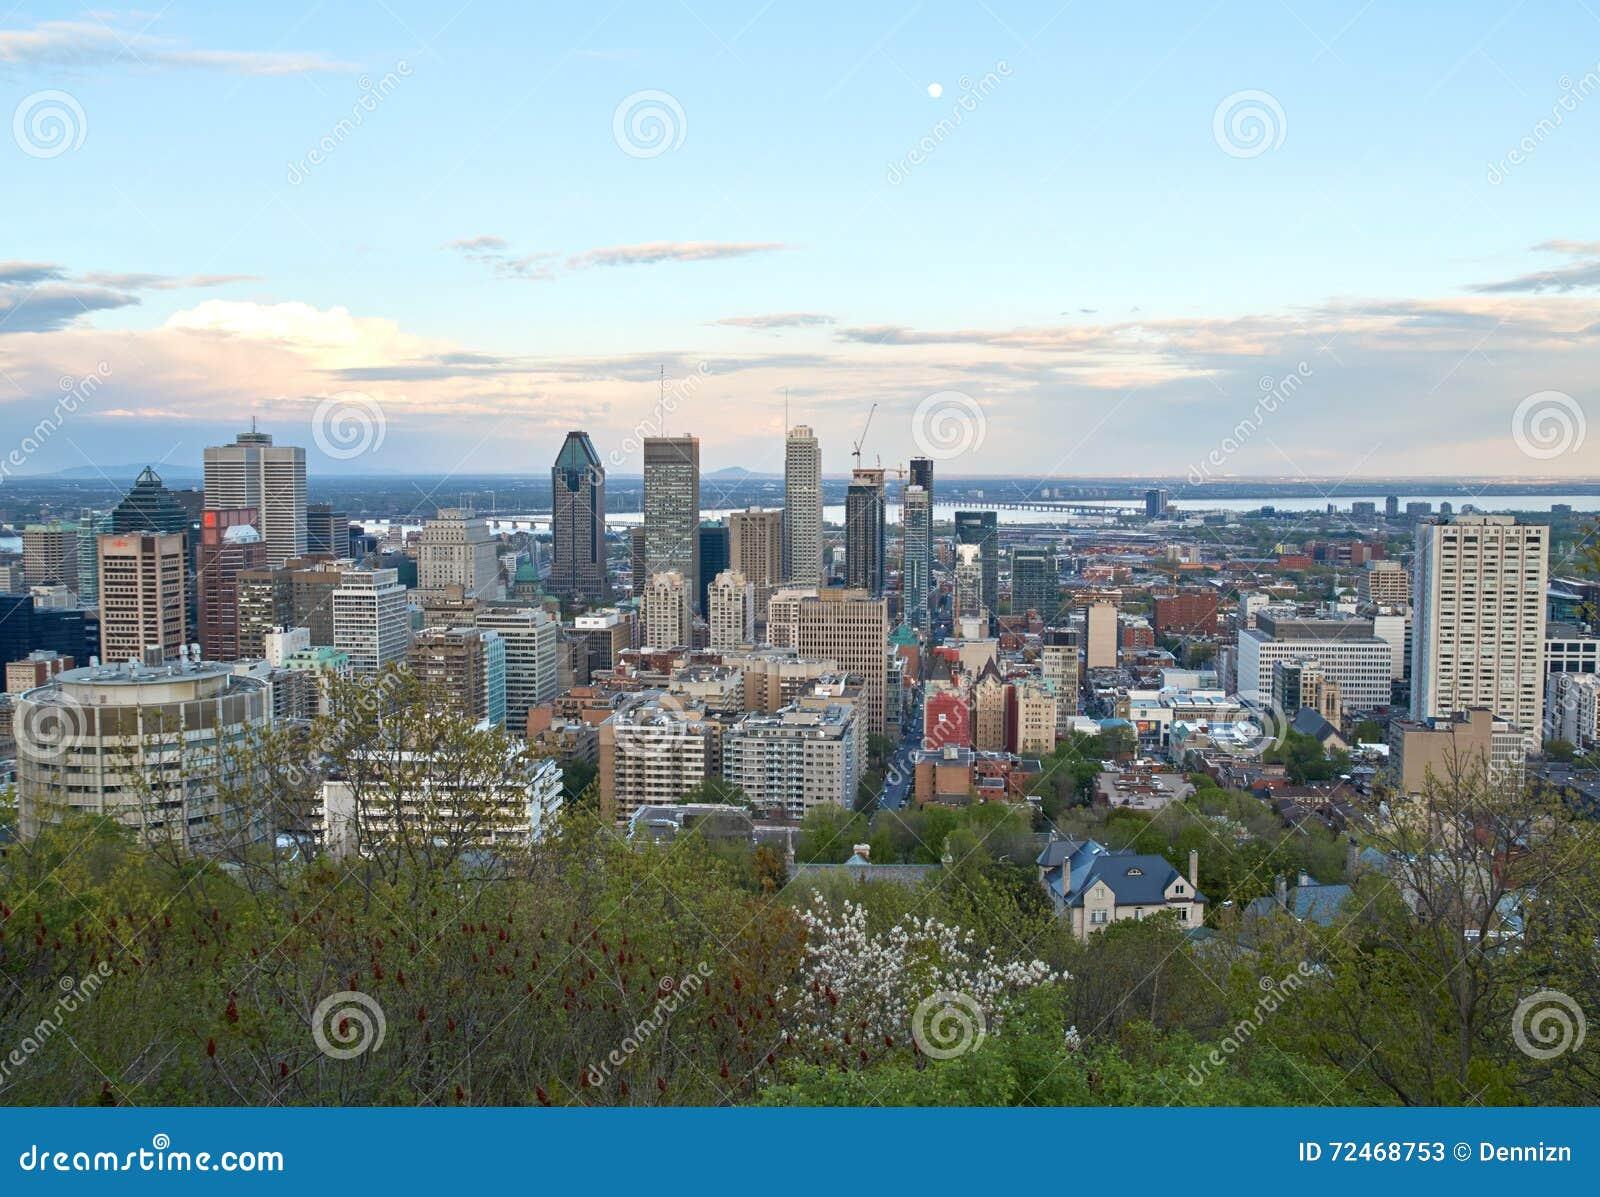 Montreal, scenic view